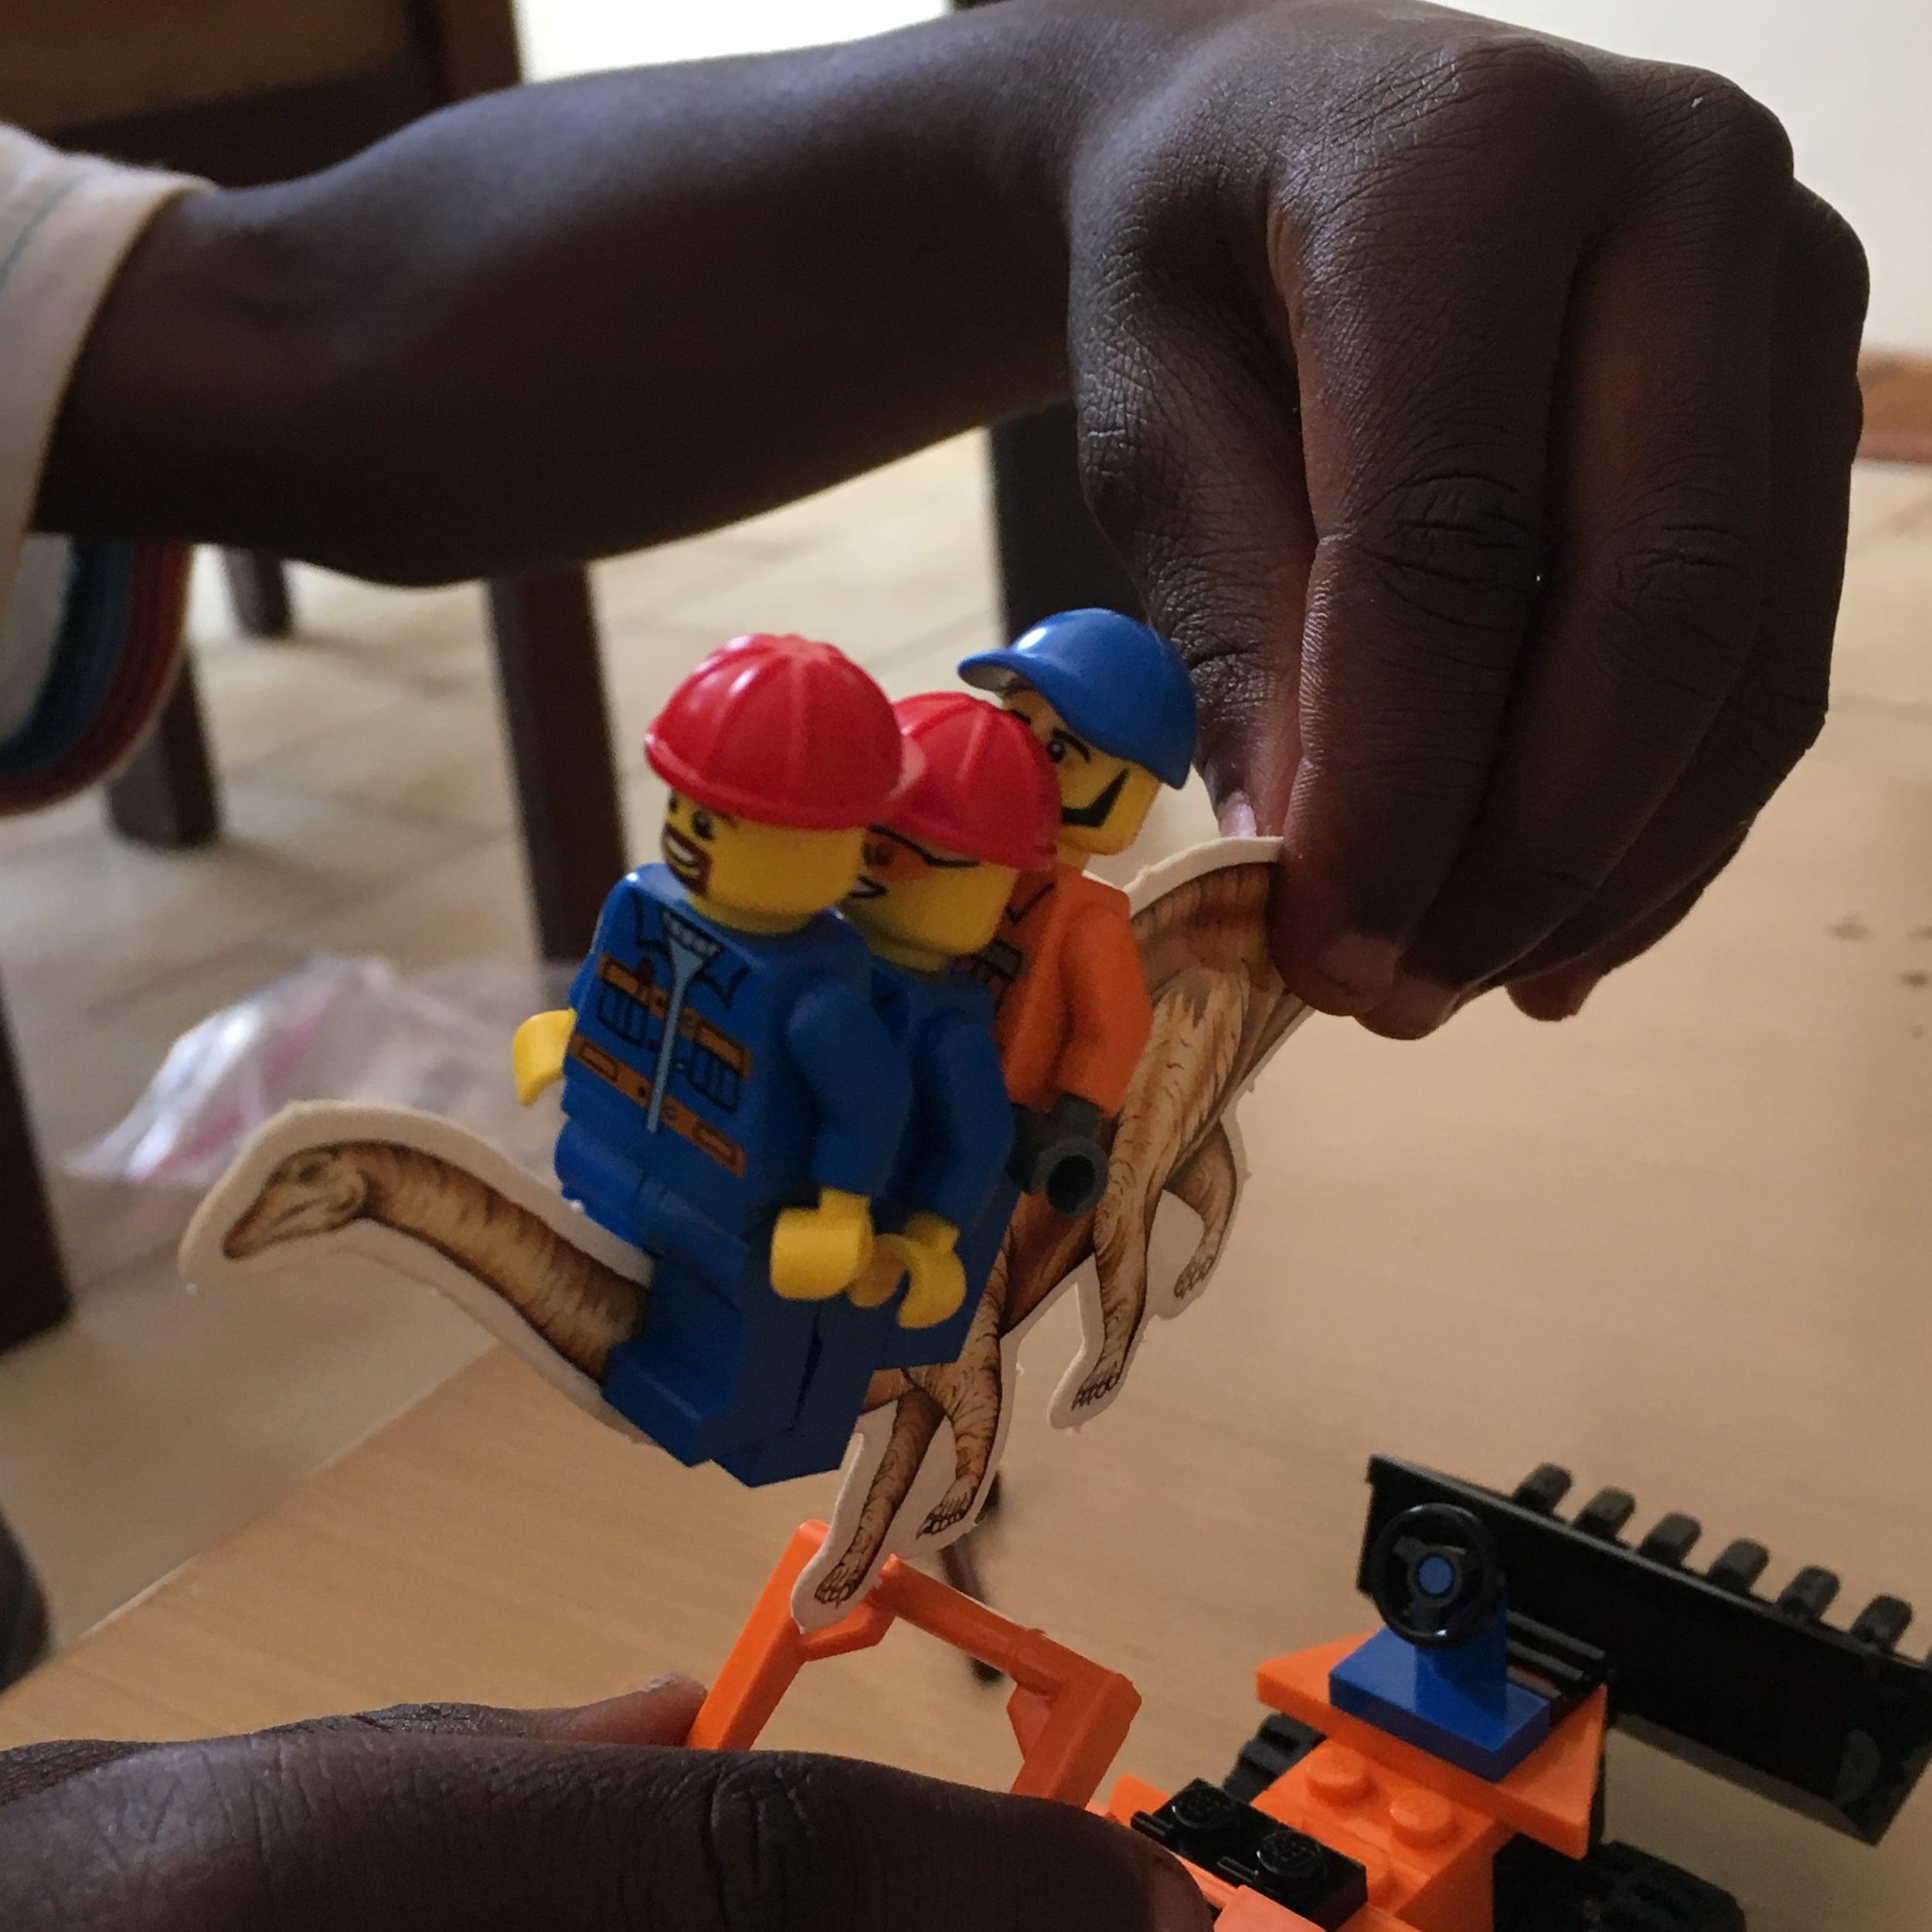 Lego construction men riding helpful dinosaurs—naturally.